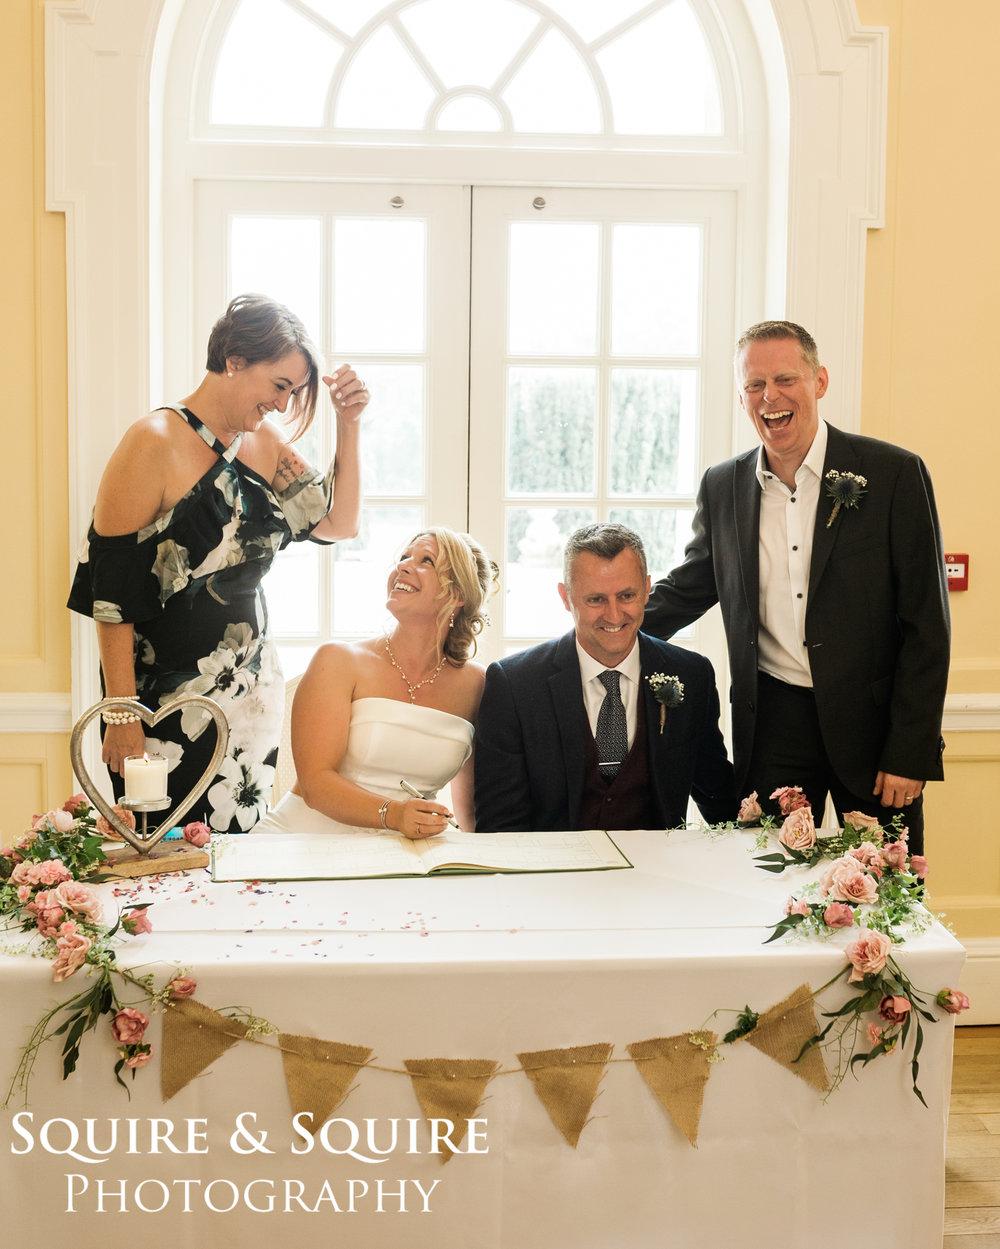 wedding_photography_catthorpe Manor (38 of 66).jpg